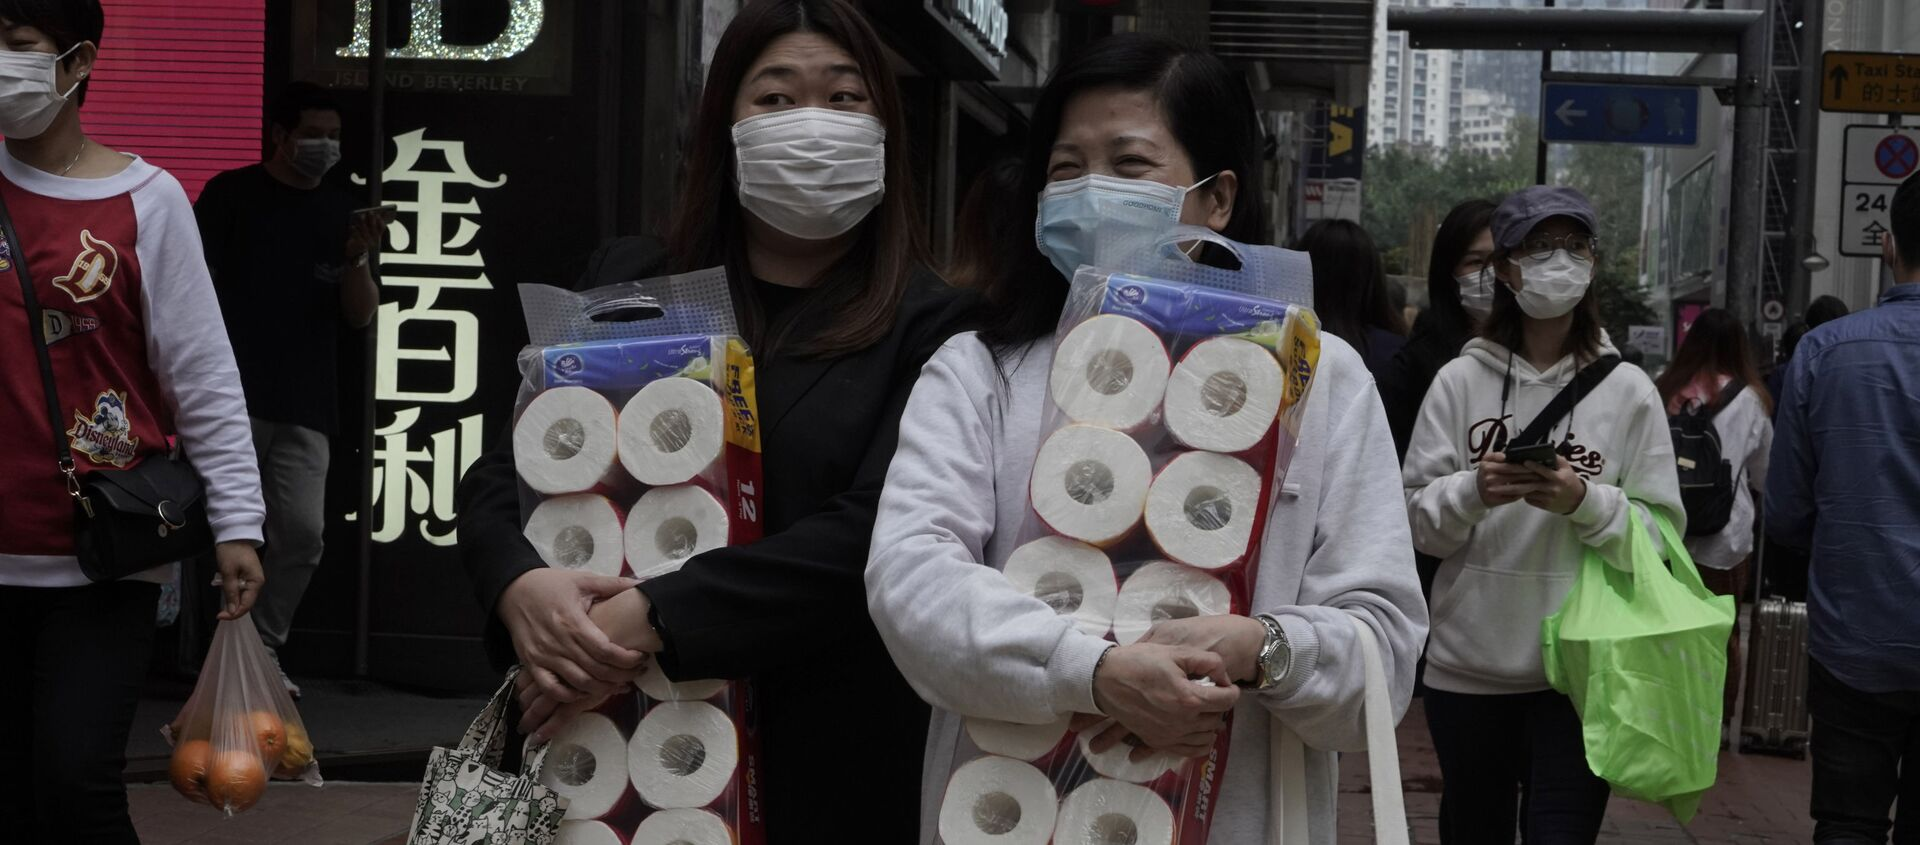 Coronavirus in Cina - Sputnik Italia, 1920, 27.01.2021